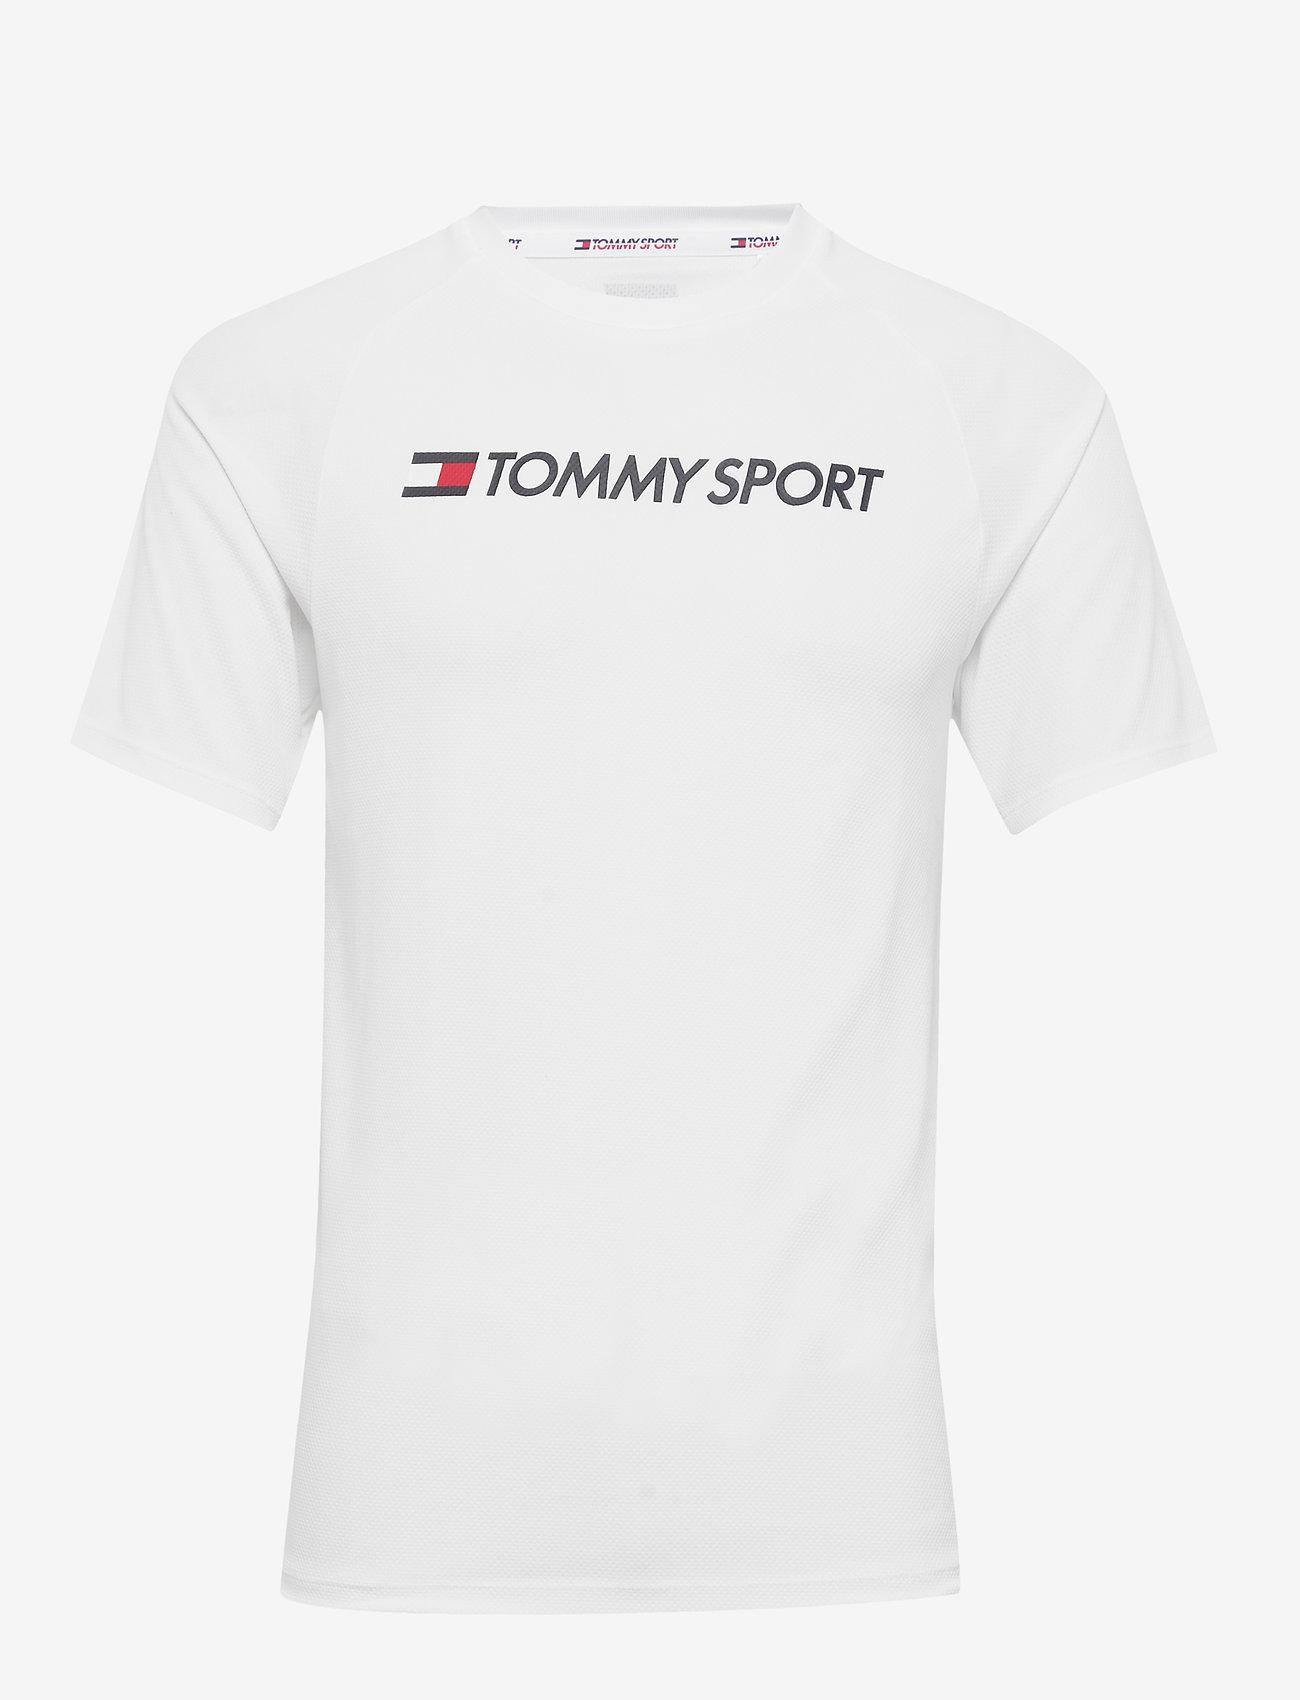 Tommy Sport - TRAINING TOP MESH LOGO - t-shirts - white - 0